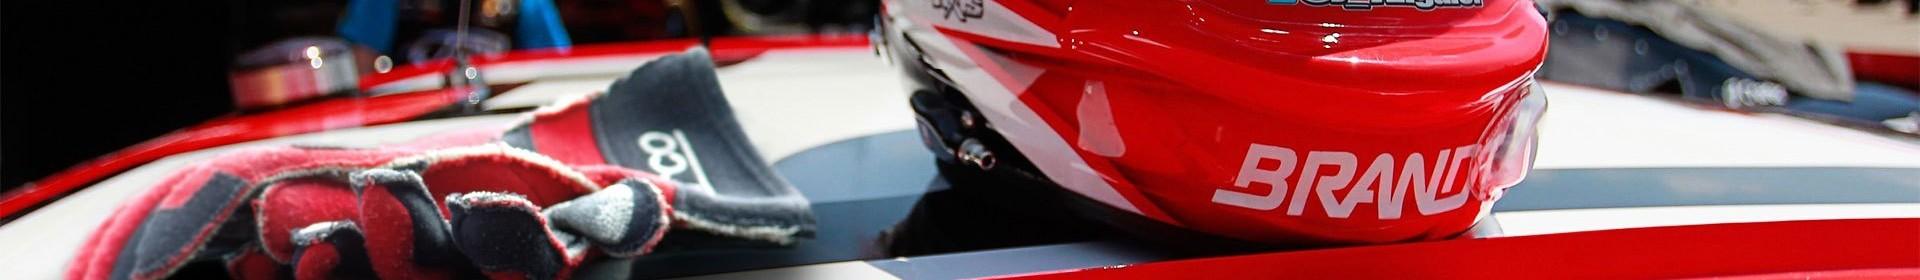 racing-gear-category-banner.jpg